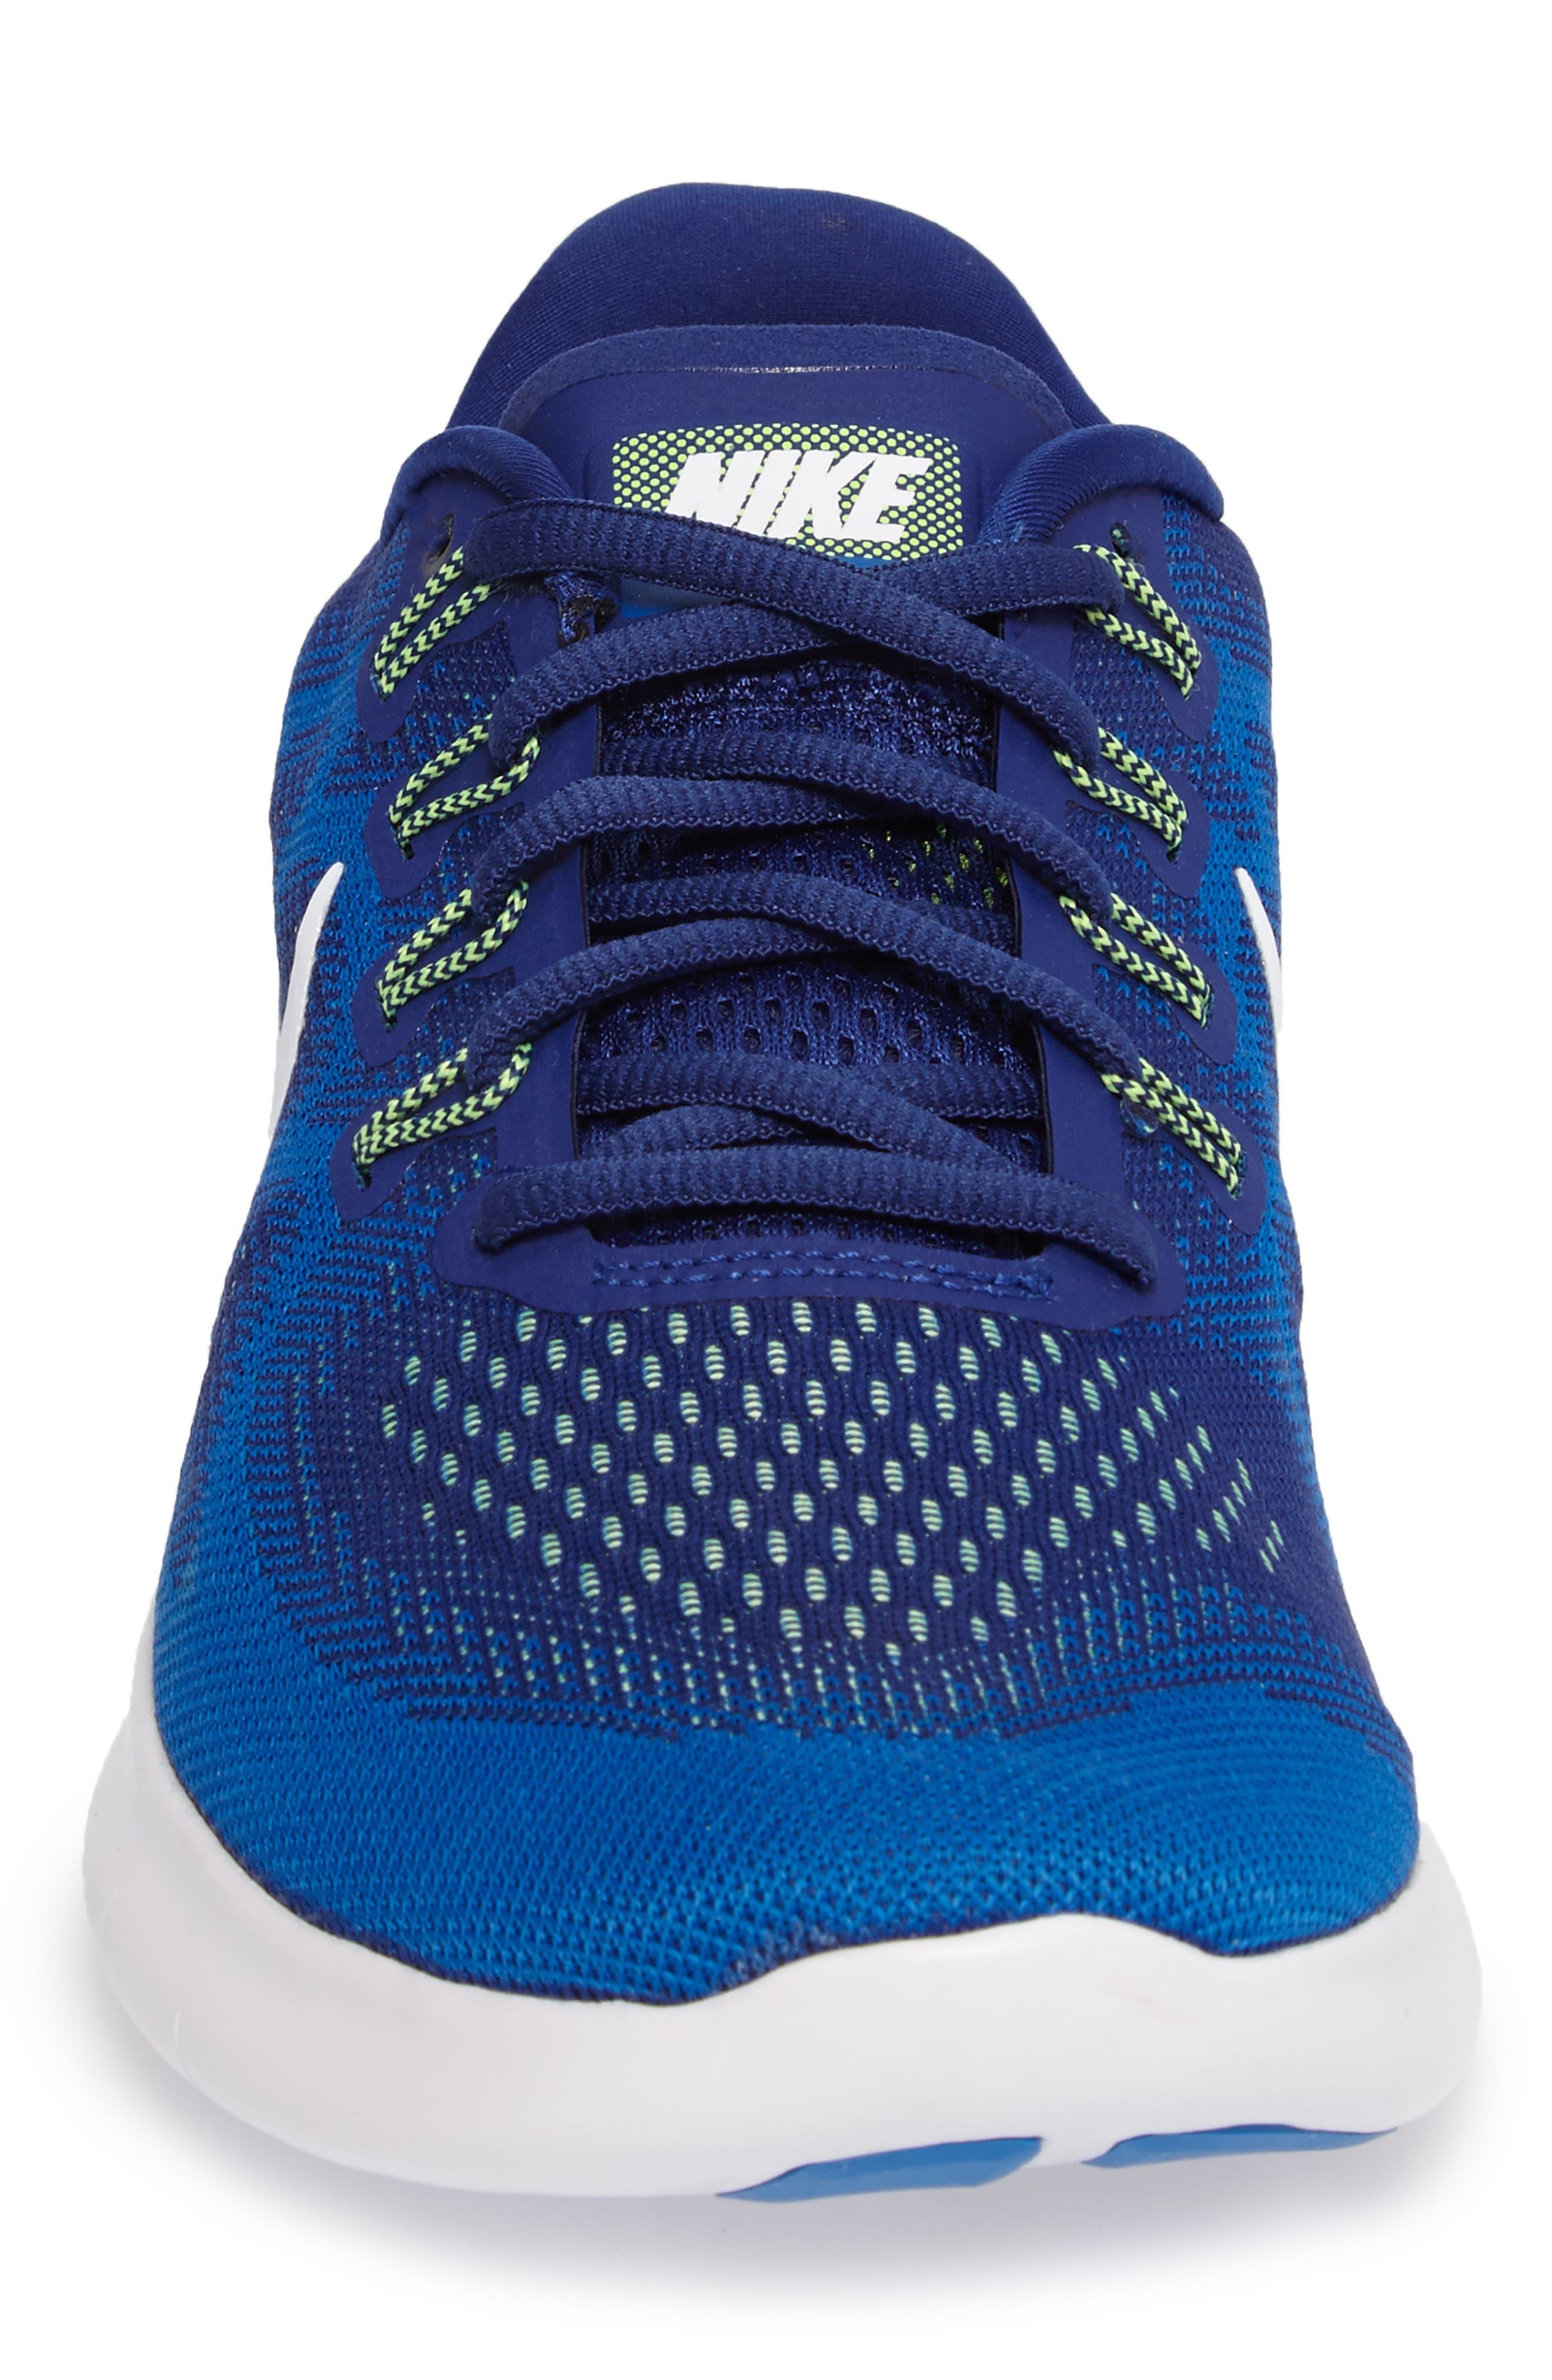 Free Run 2017 Running Shoe,                             Alternate thumbnail 49, color,